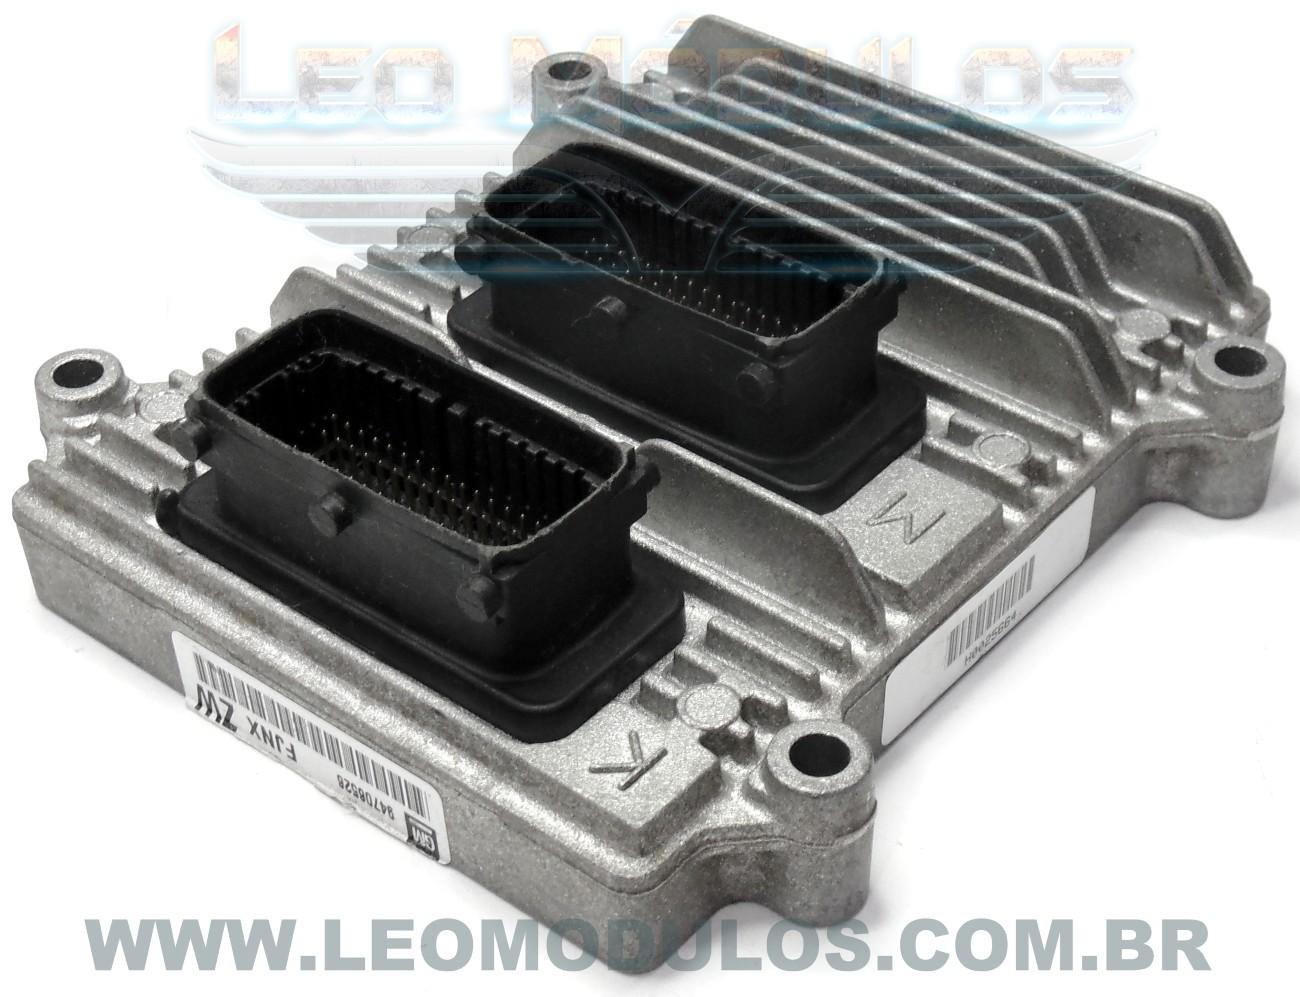 Módulo de injeção multec HSFI 2.3 - FJNX ZW 94706526 - Chevrolet Celta Prisma 1.0 Flex VHCE - FJNX ZW - Leo Módulos